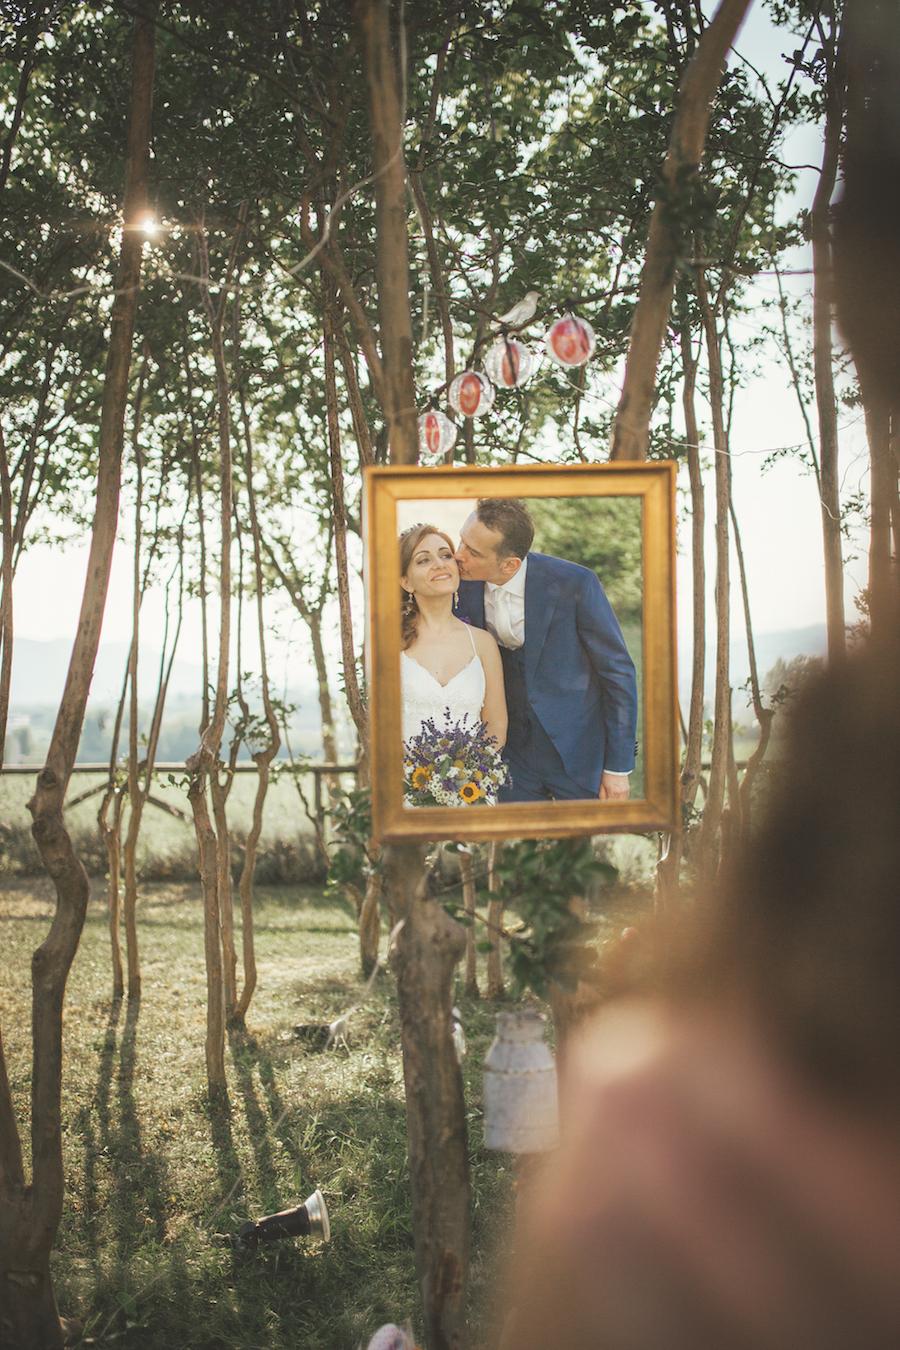 matrimonio-ecofriendly-a-caserta-gabriella-rotondi-wedding-wondeland-20